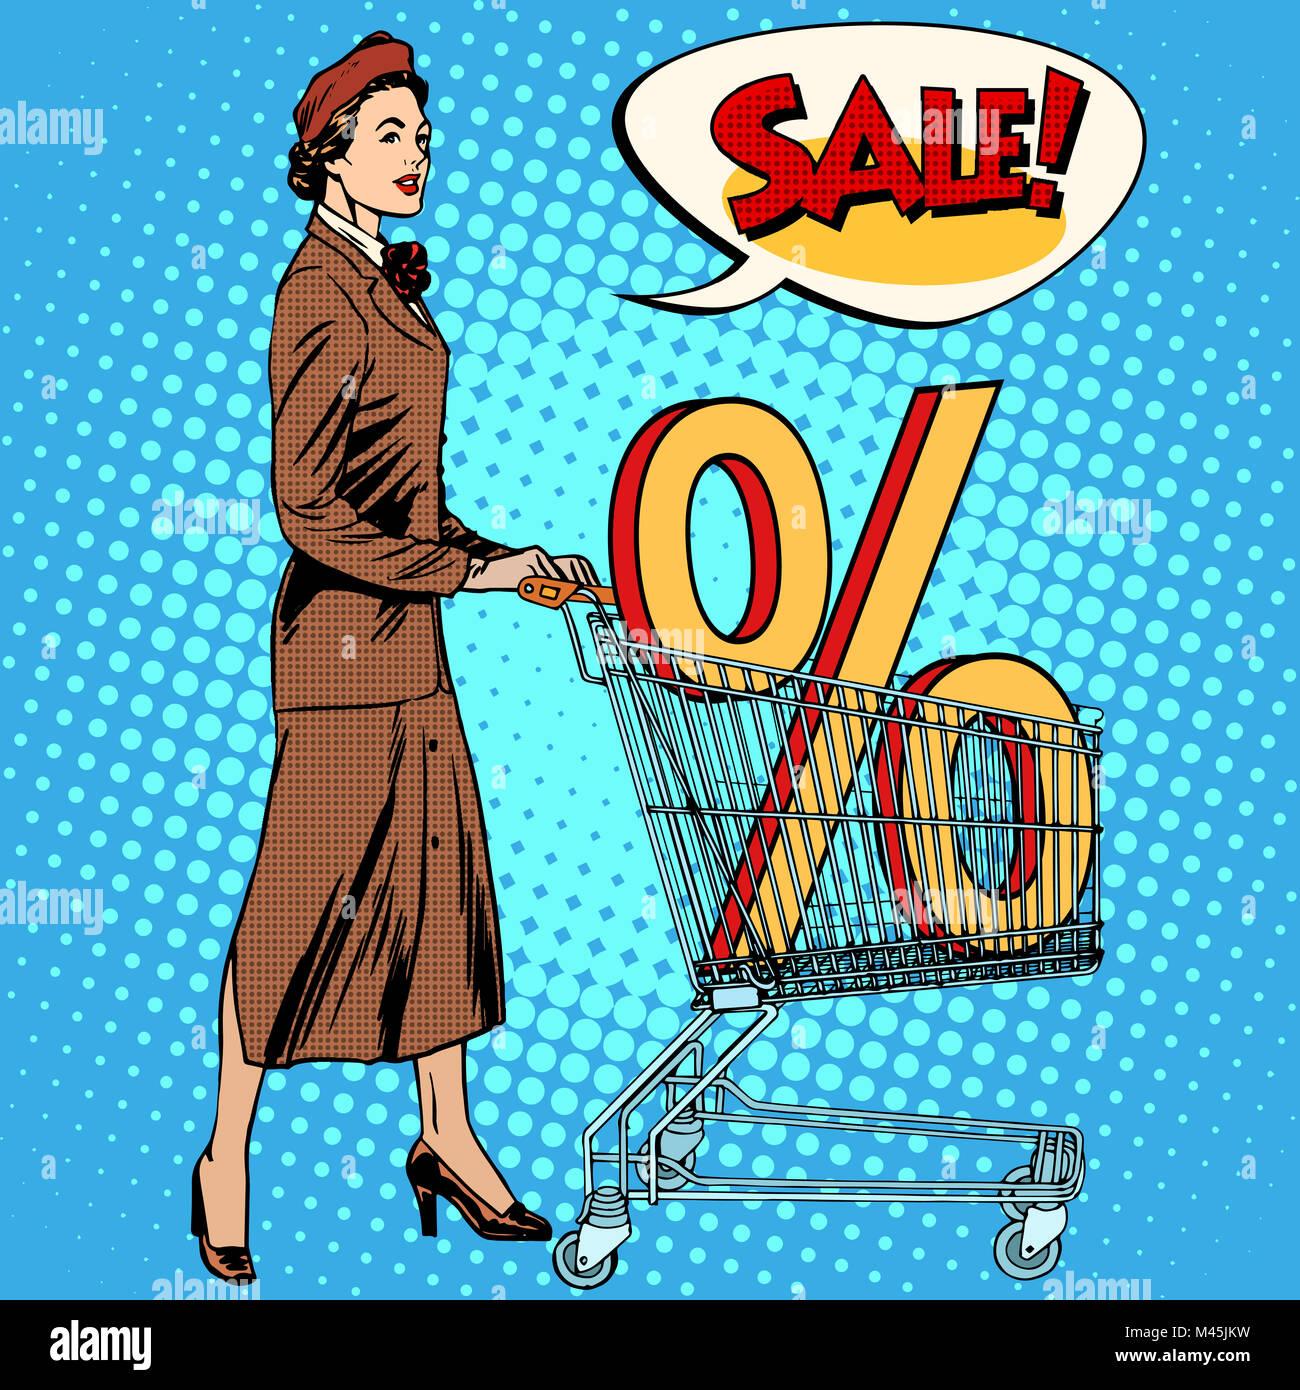 Buyer discounts sale grocery cart - Stock Image